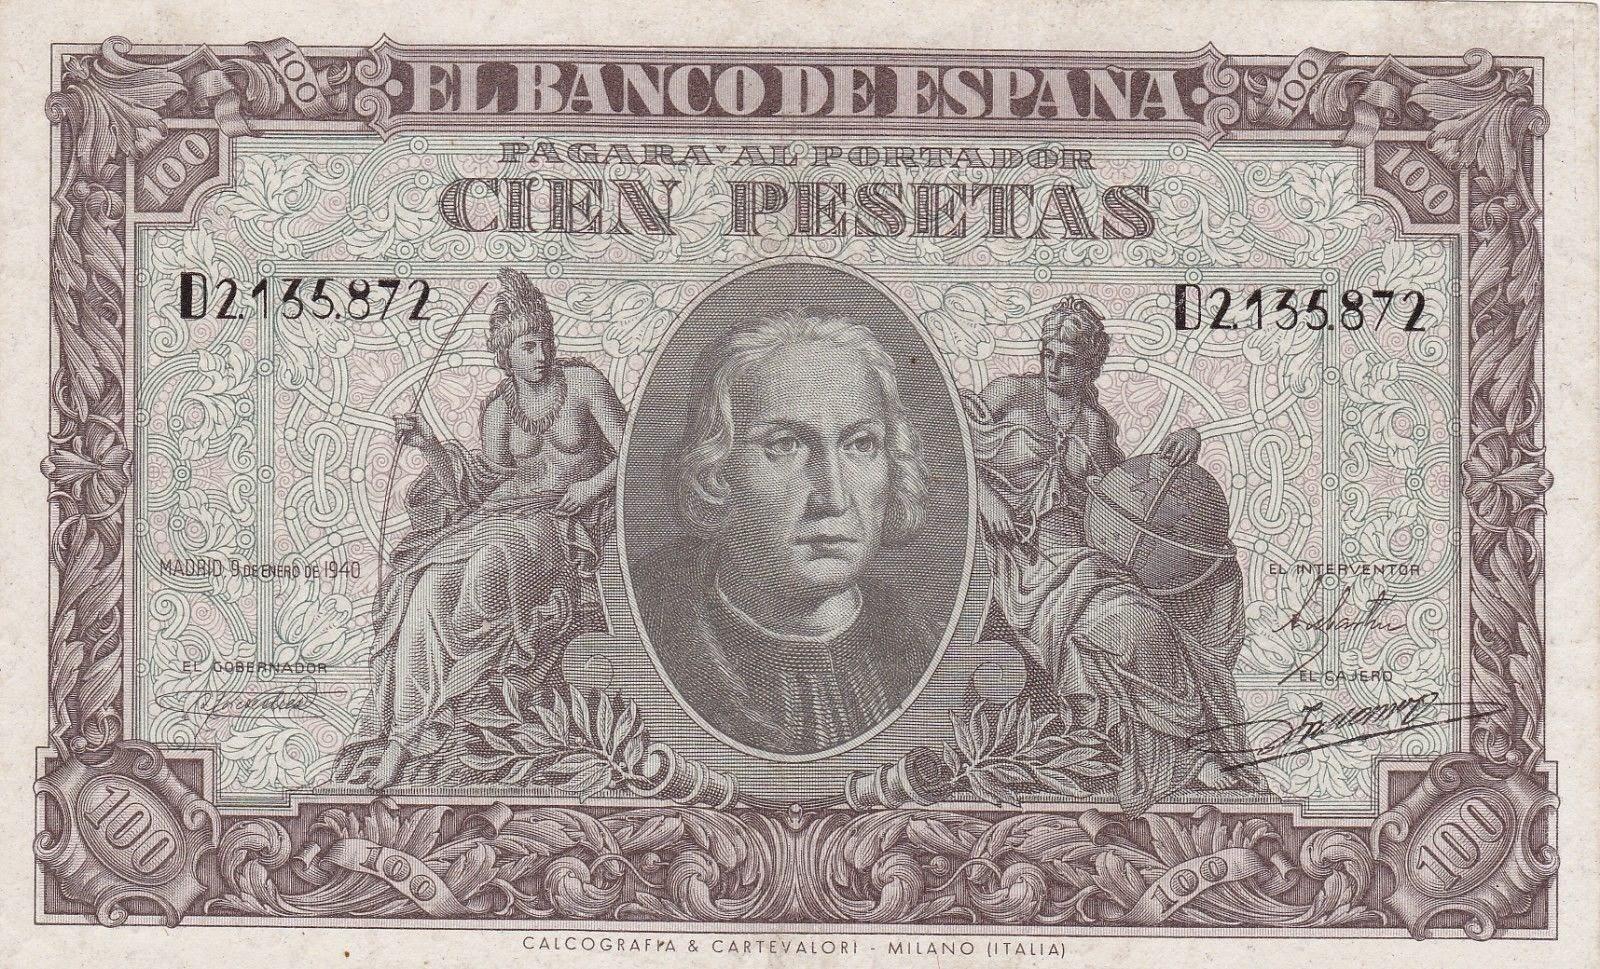 Spain Banknotes 100 Pesetas banknote 1940 Christopher Columbus